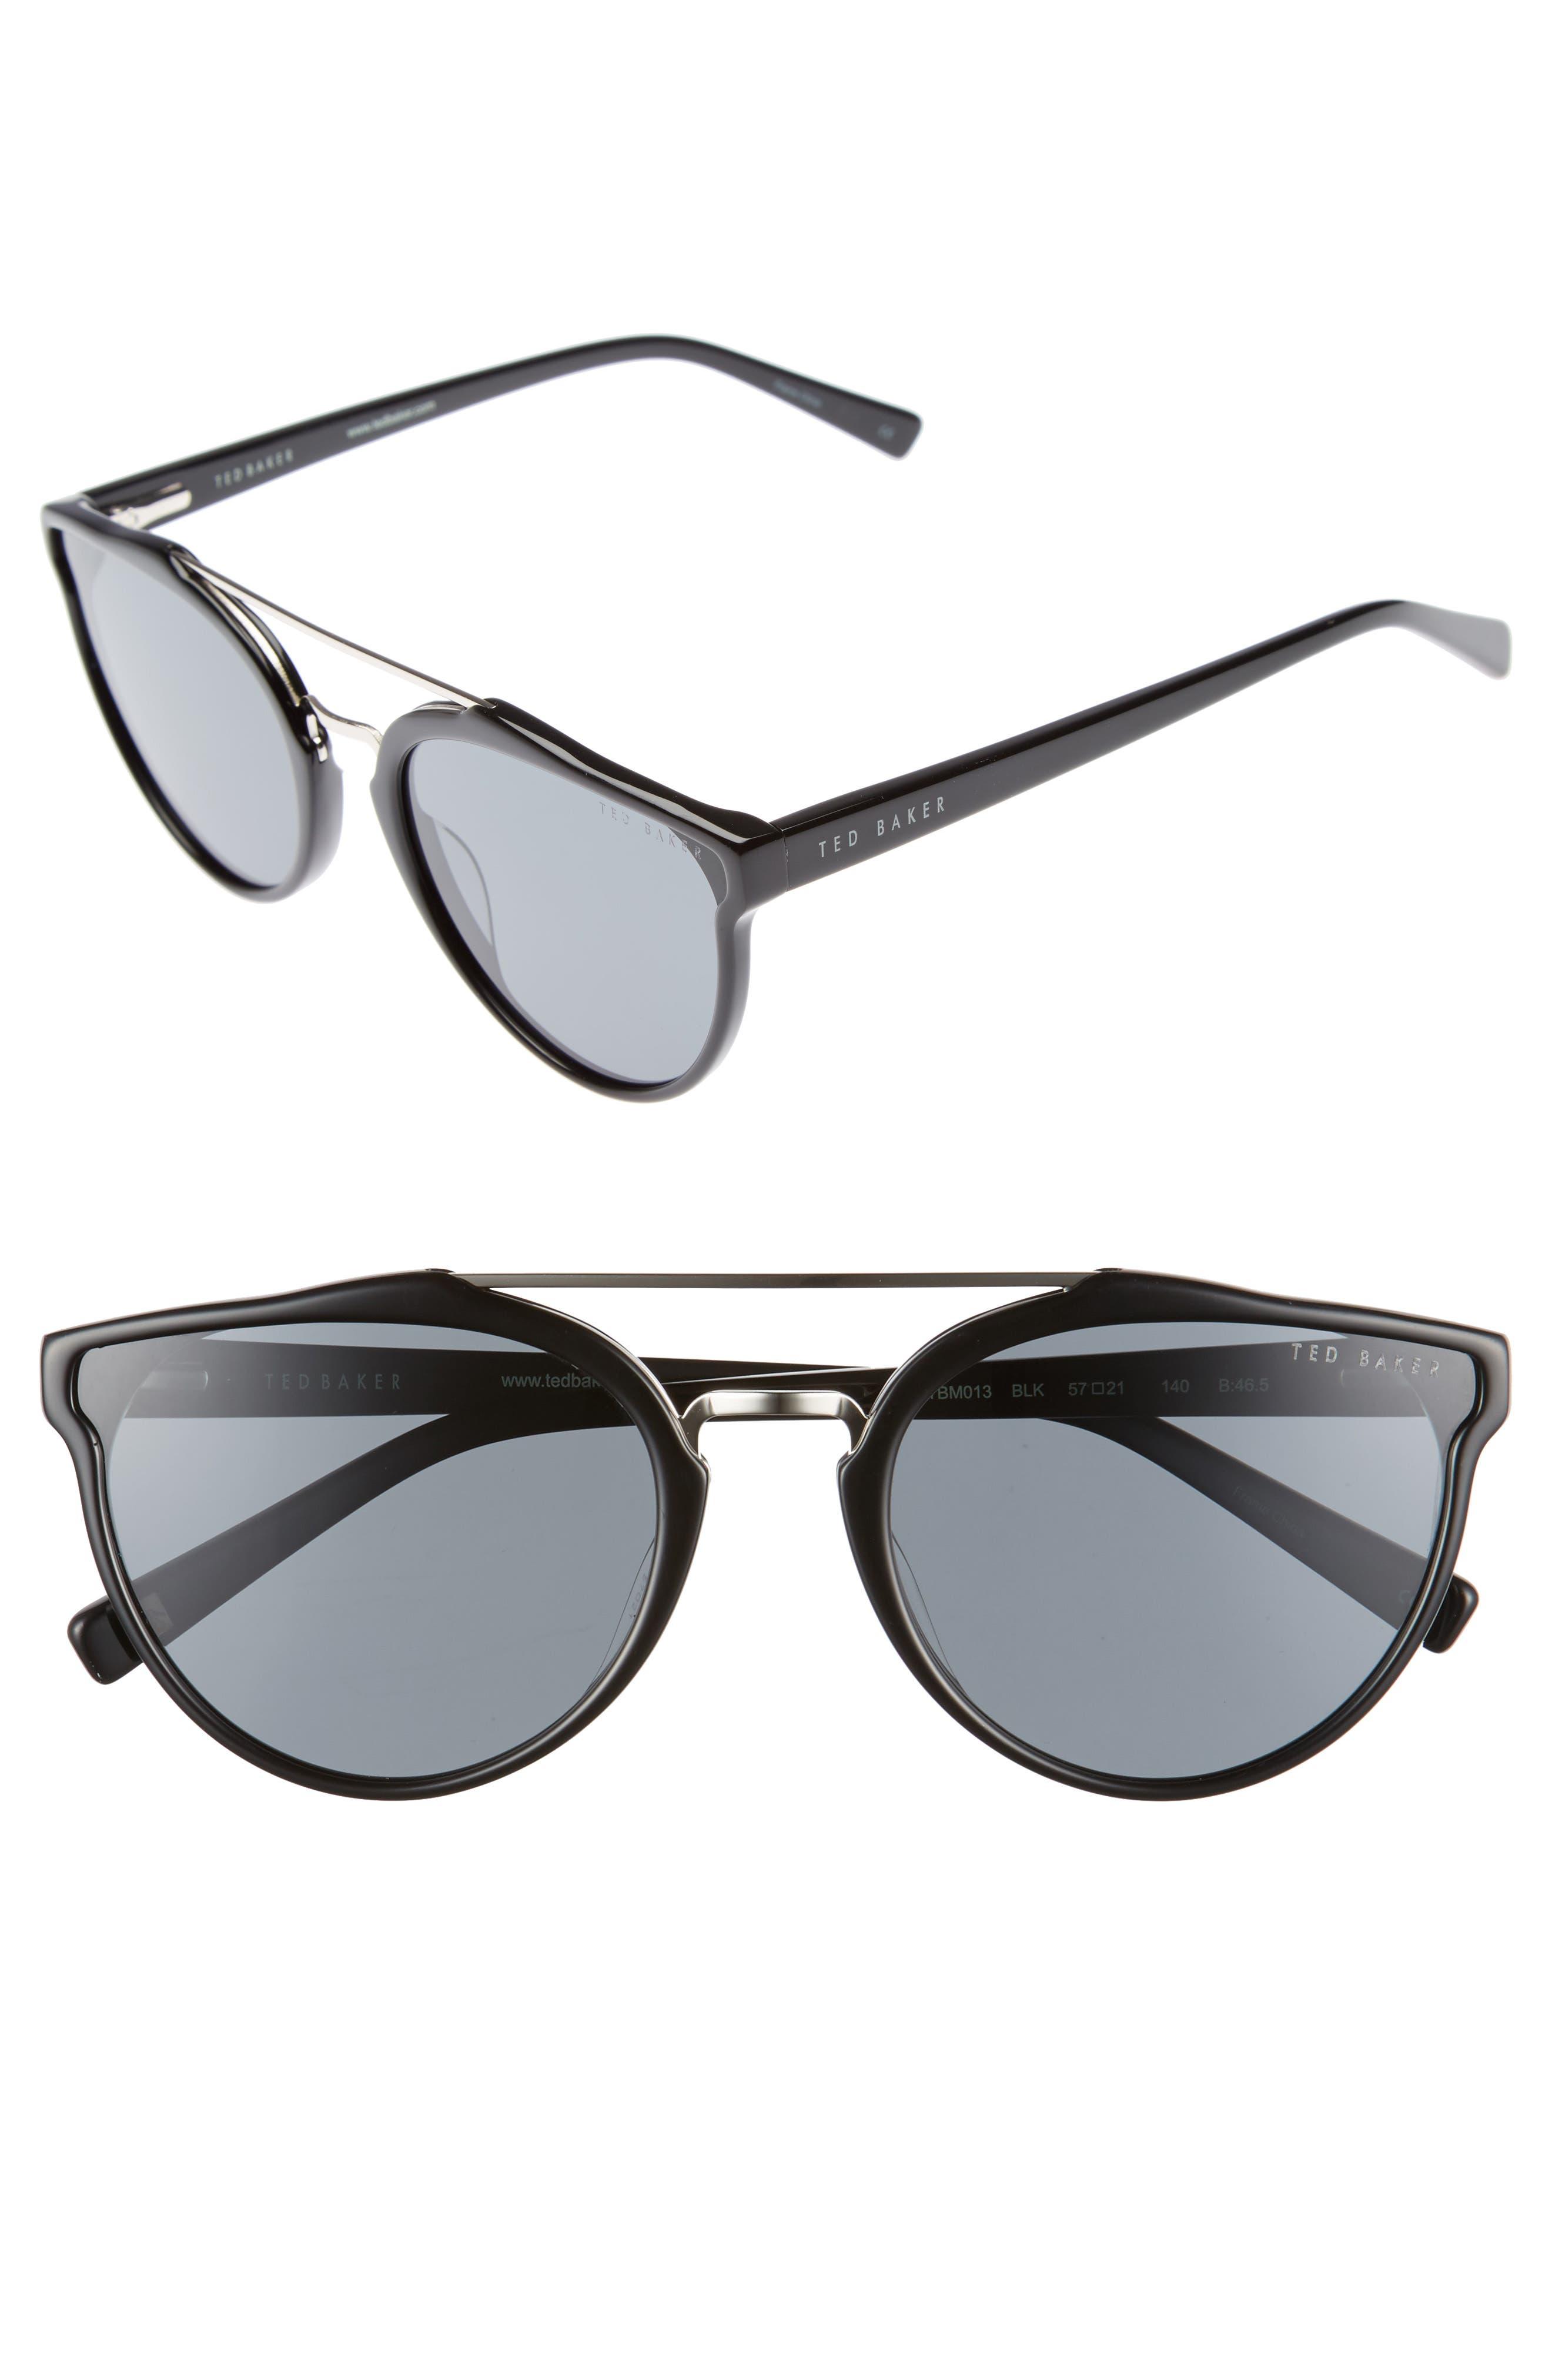 Retro 57mm Polarized Sunglasses,                             Main thumbnail 1, color,                             001